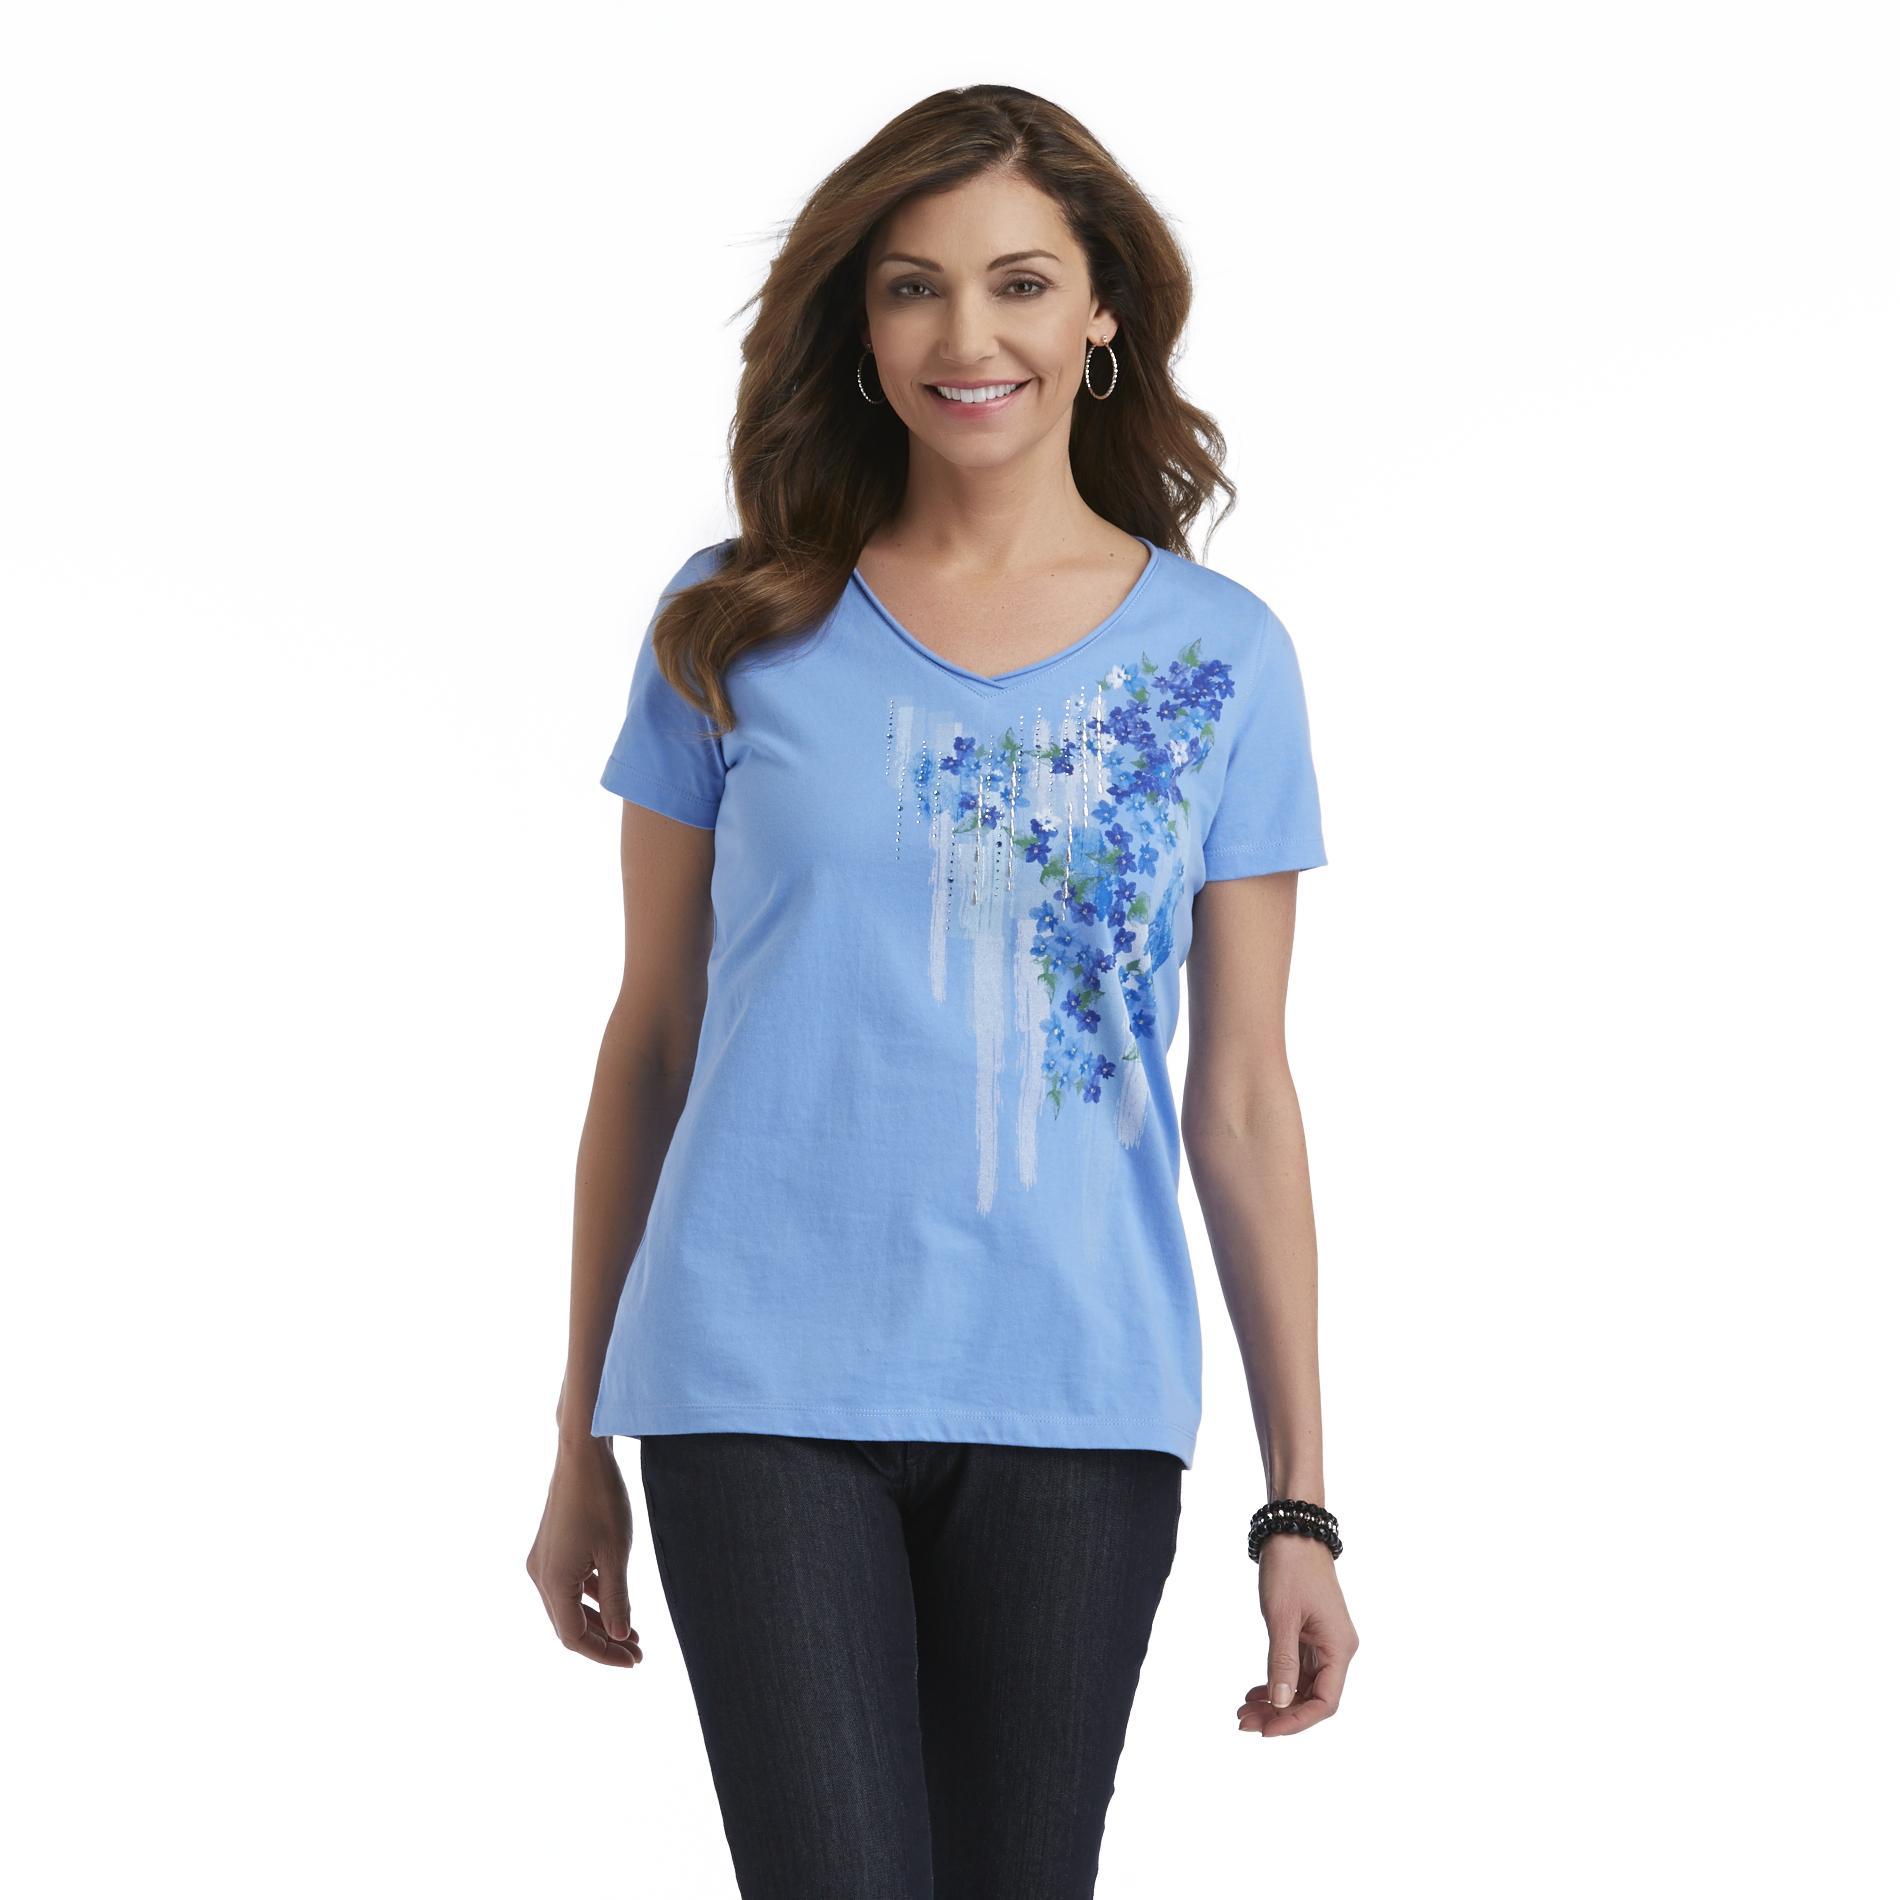 Laura Scott Women's V-Neck T-Shirt at Sears.com